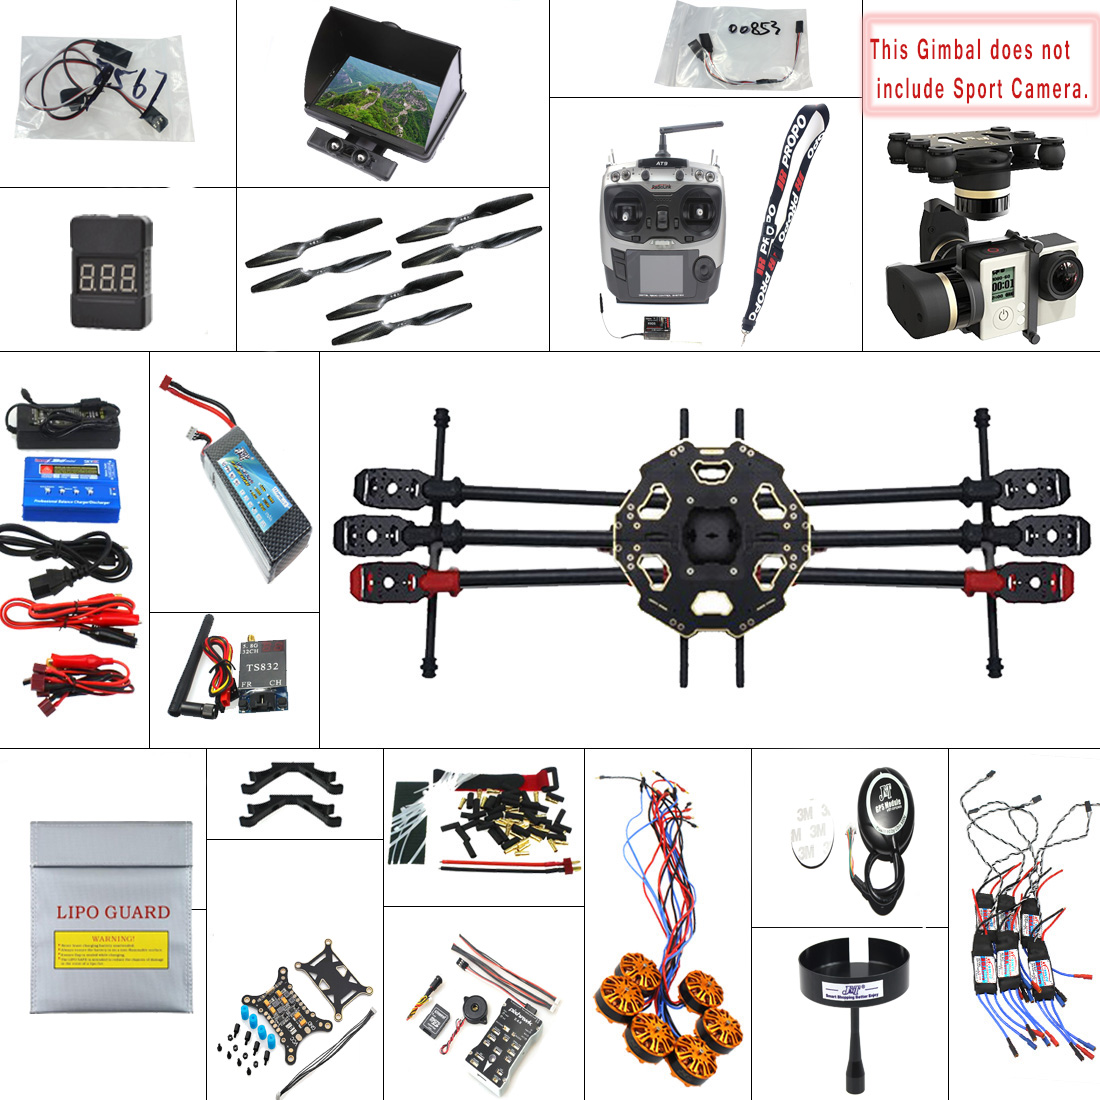 F07807-G 2.4G 9CH 680PRO PX4 GPS 5.8G Video FPV RC Hexacopter Unassembled Full Kit RTF DIY RC Drone Combo MINI3D Pro Gimbal